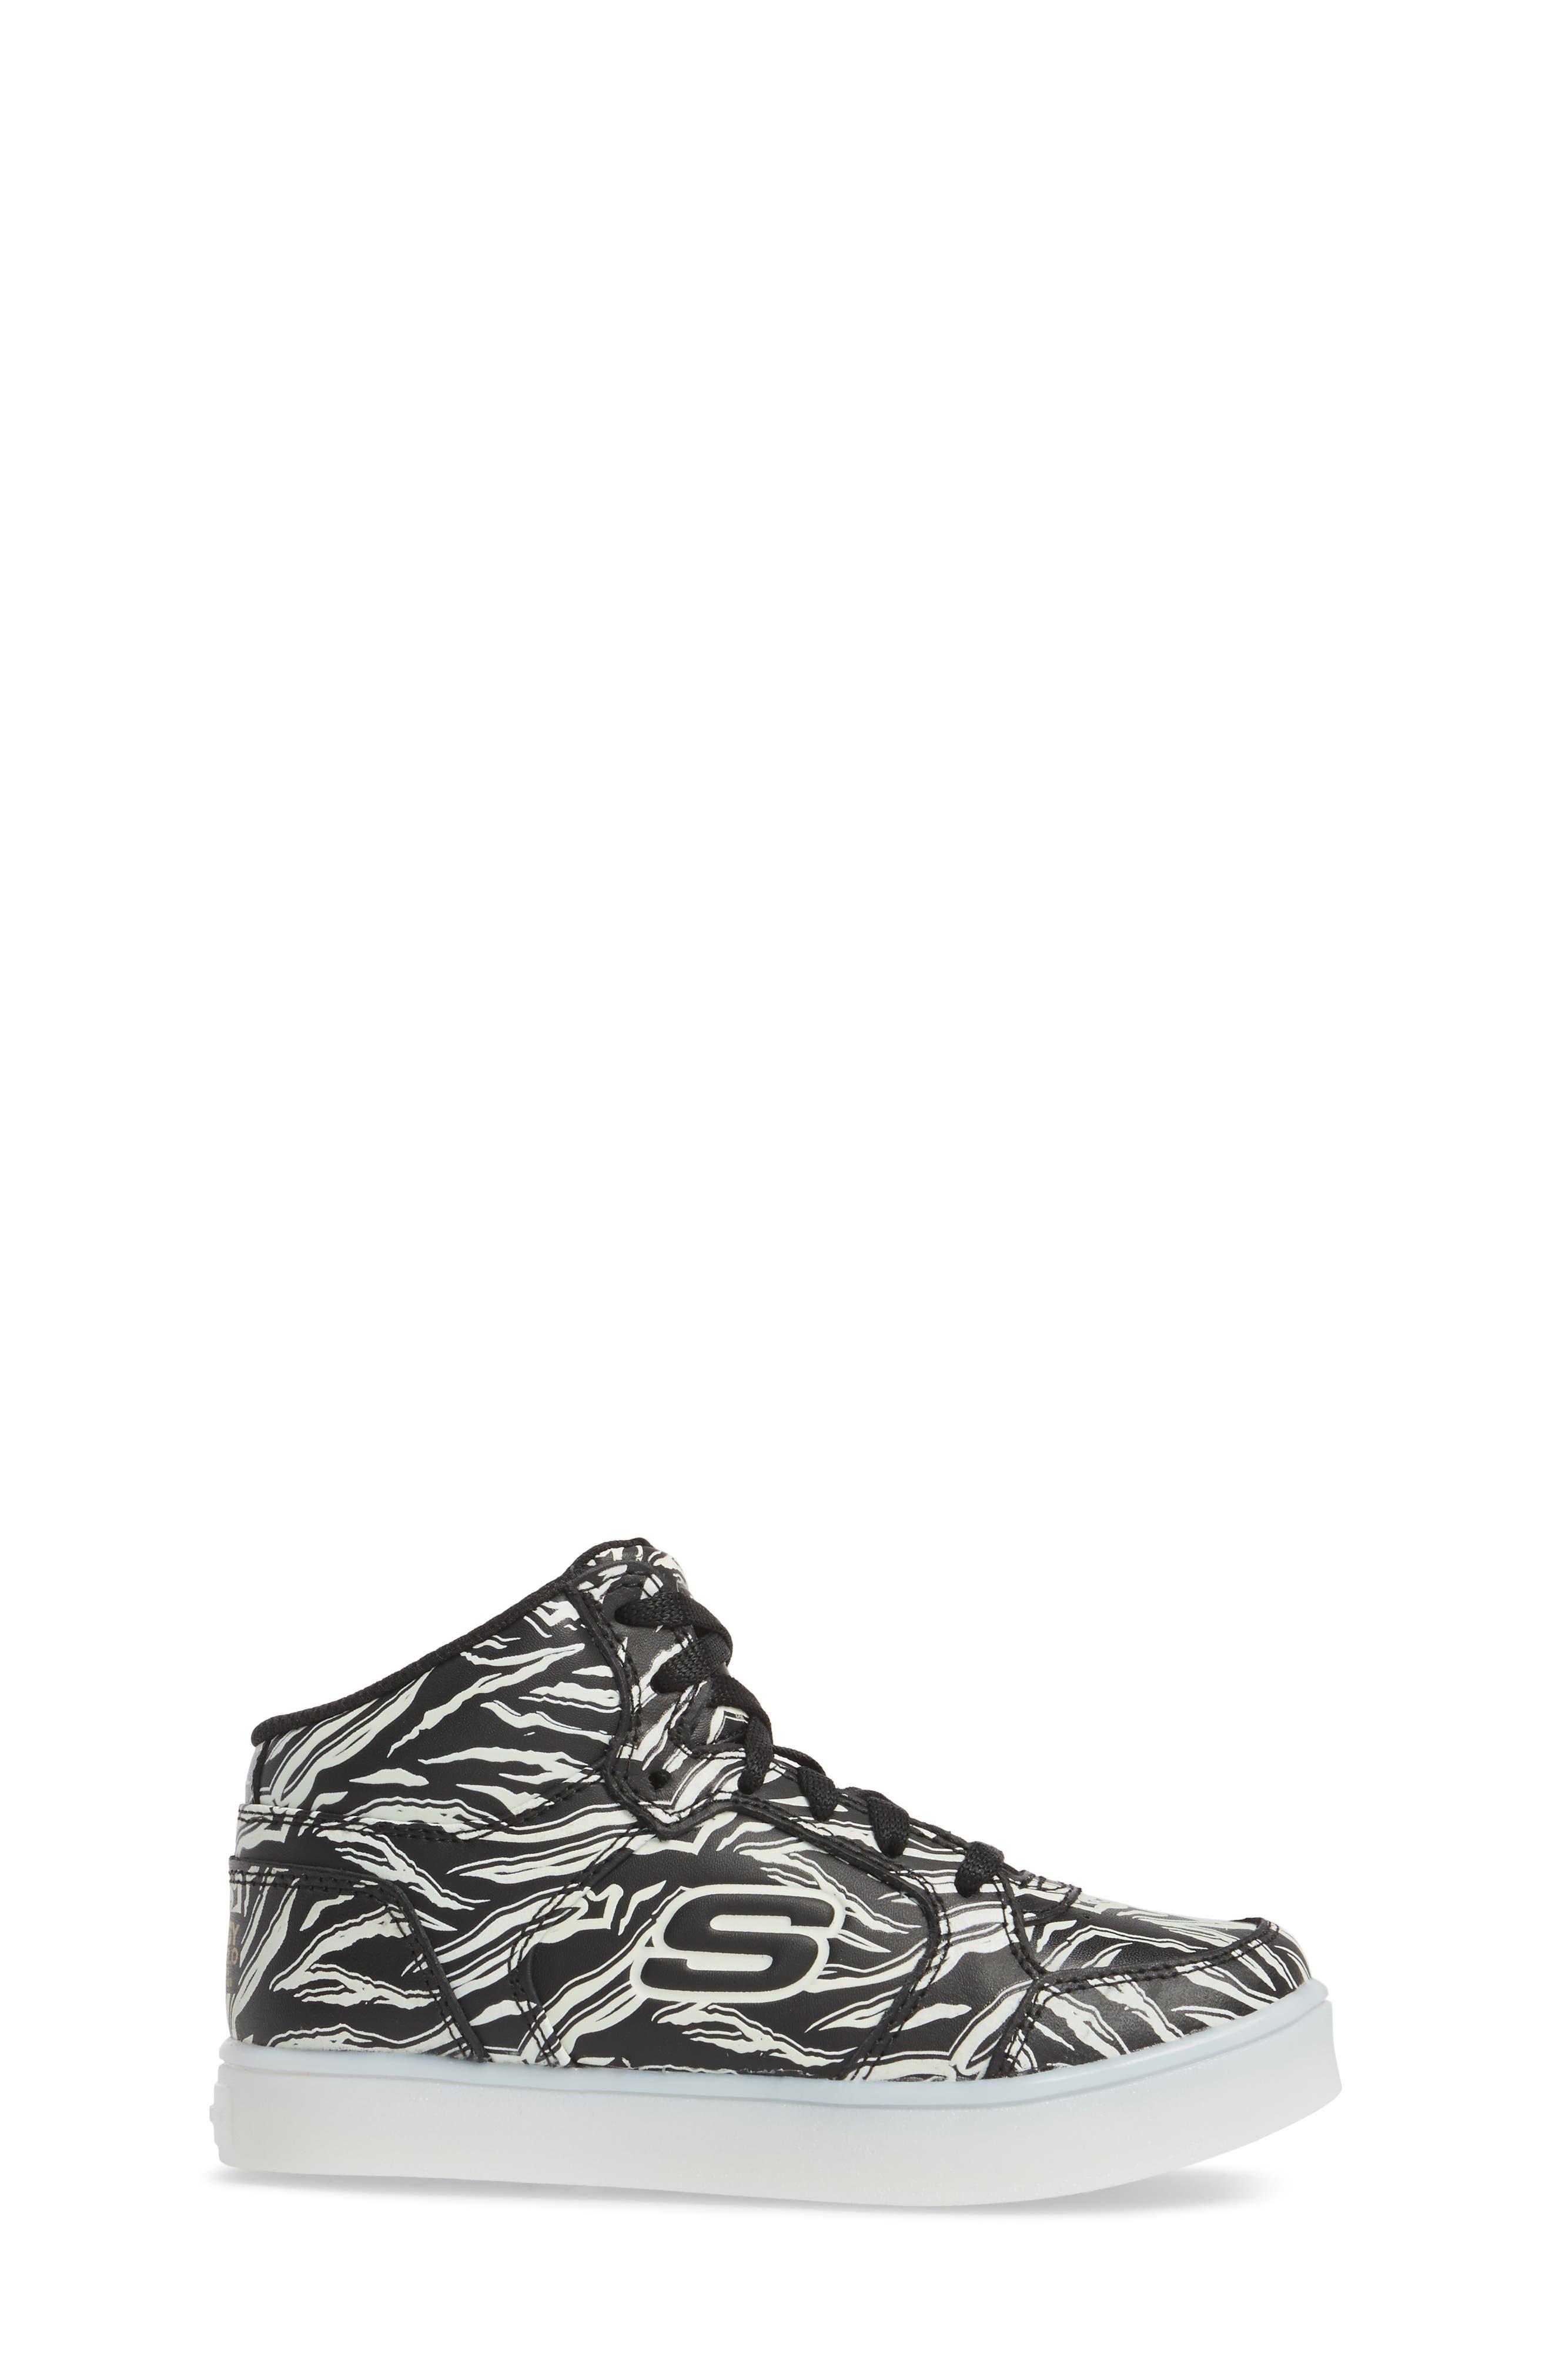 Energy Lights Glow in the Dark Sneaker,                             Alternate thumbnail 3, color,                             017